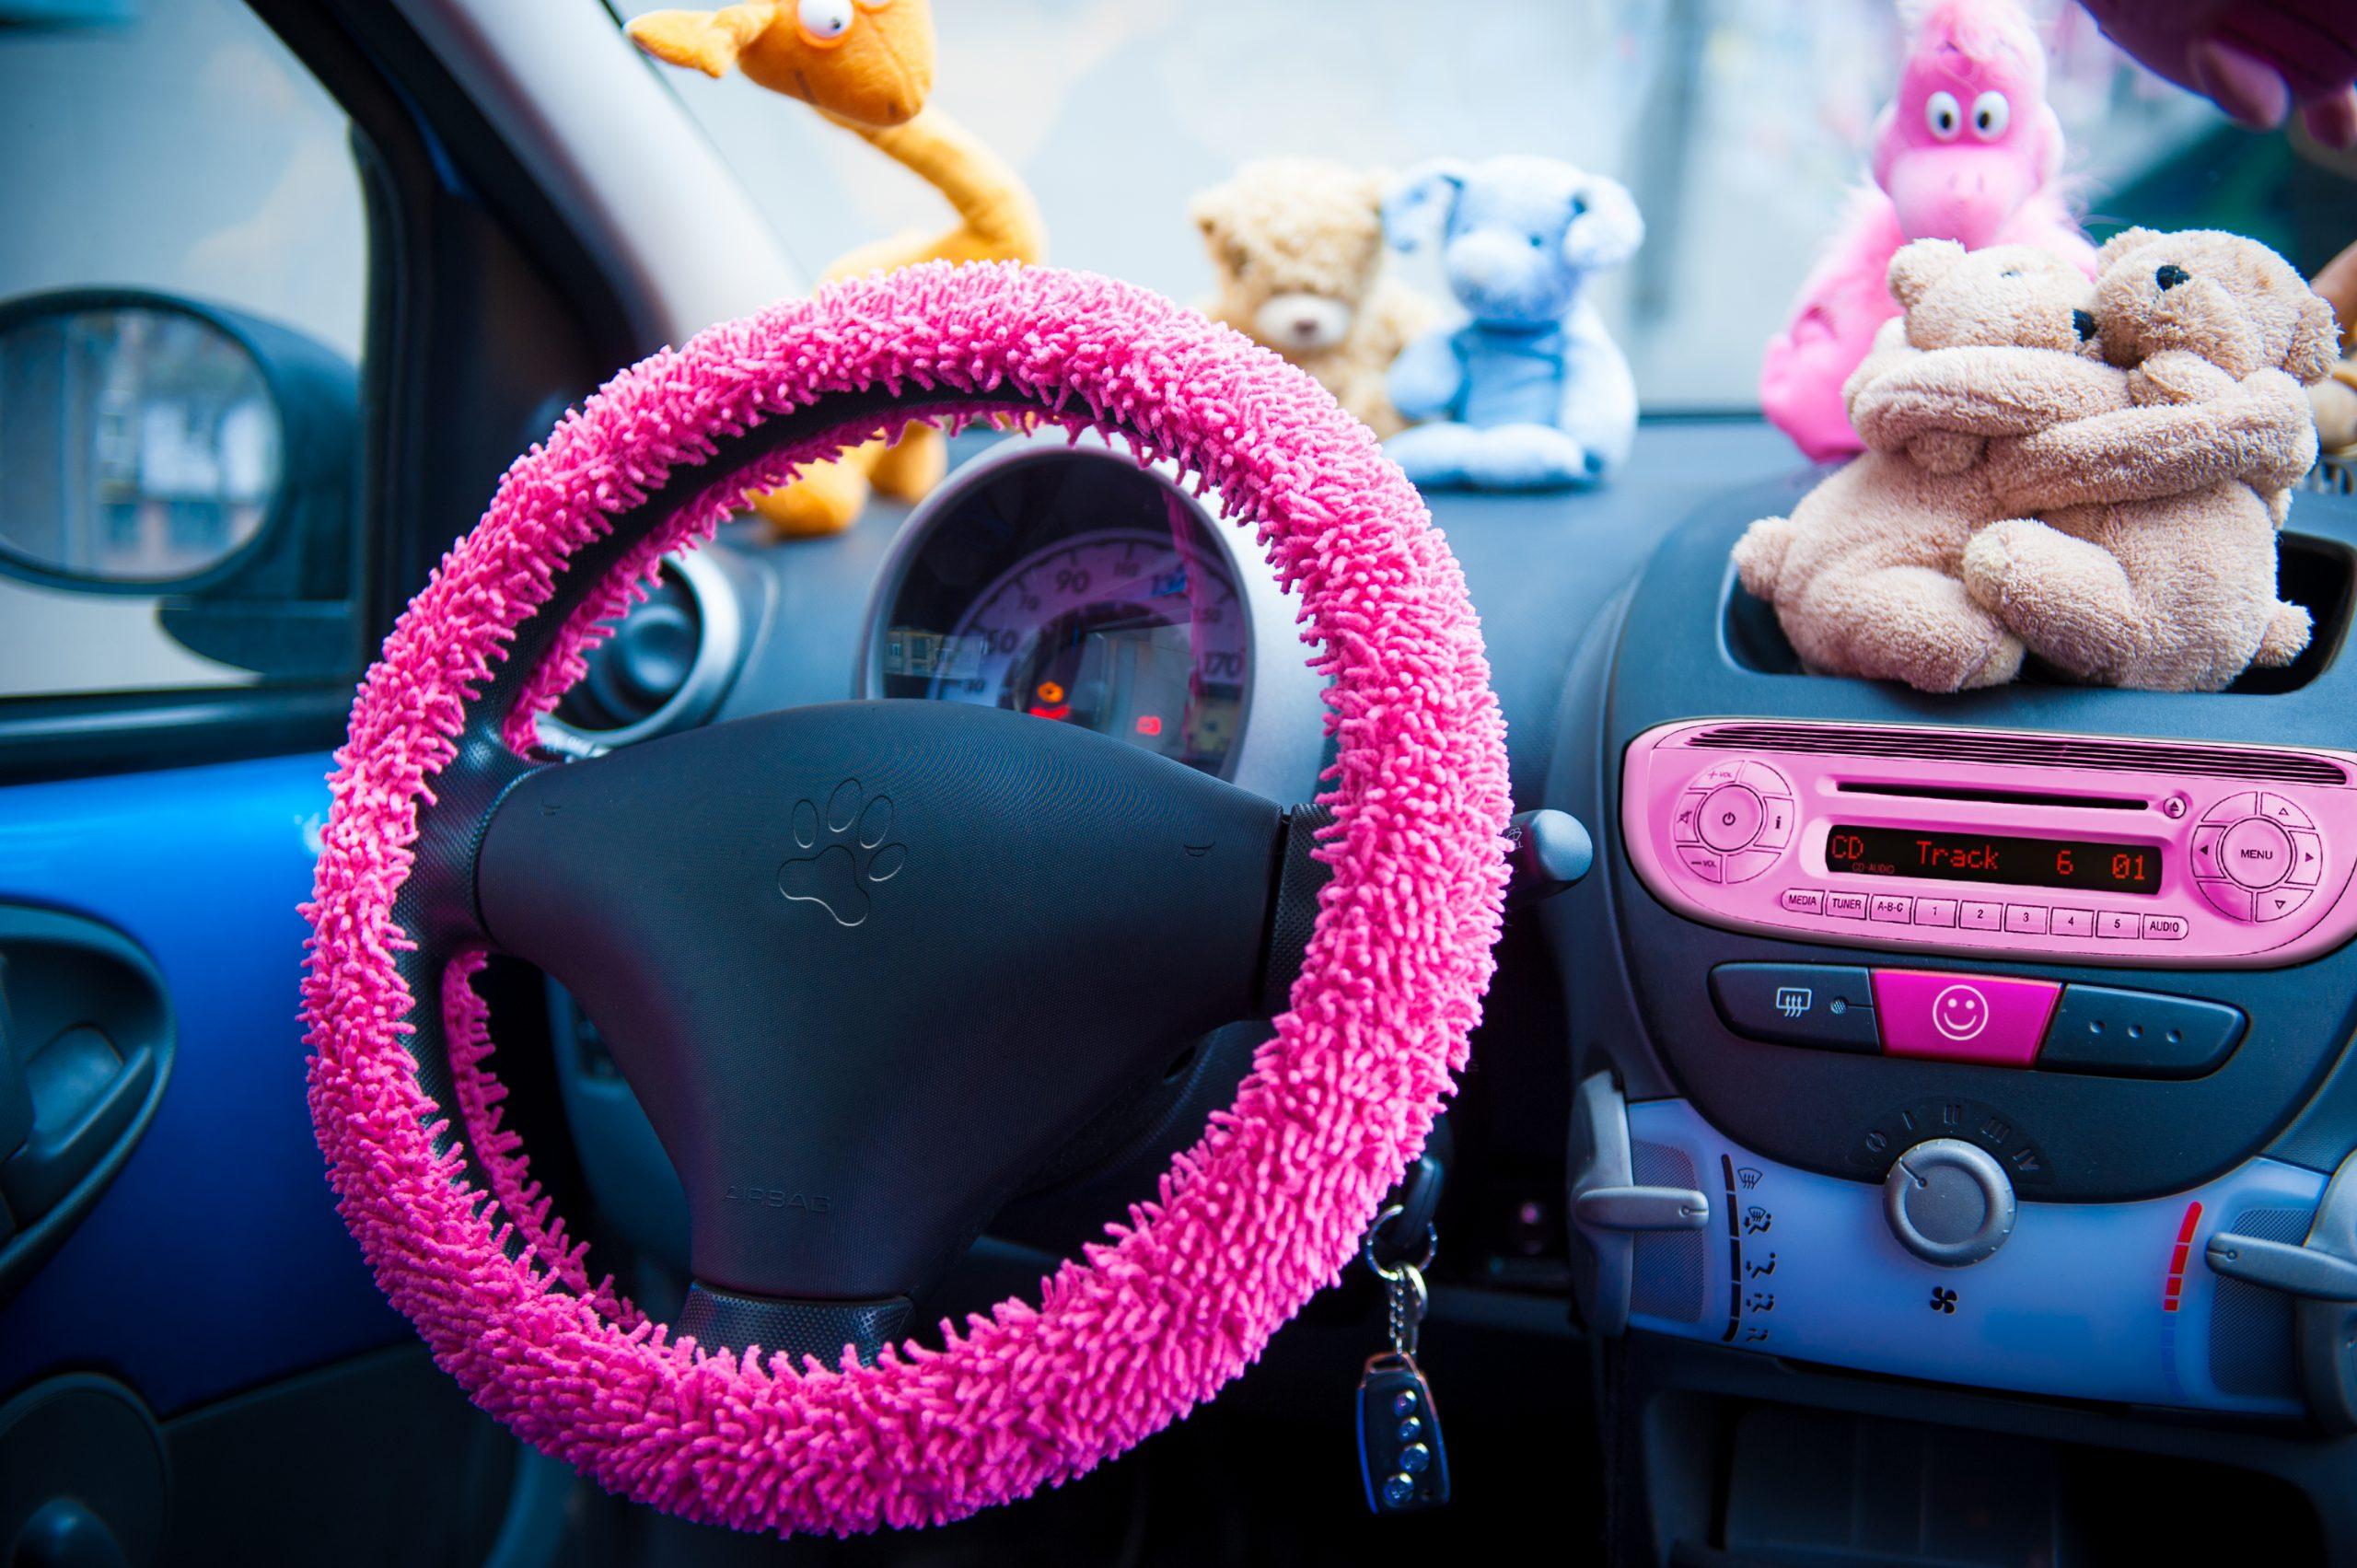 I'm giving away my car- pink steering wheel